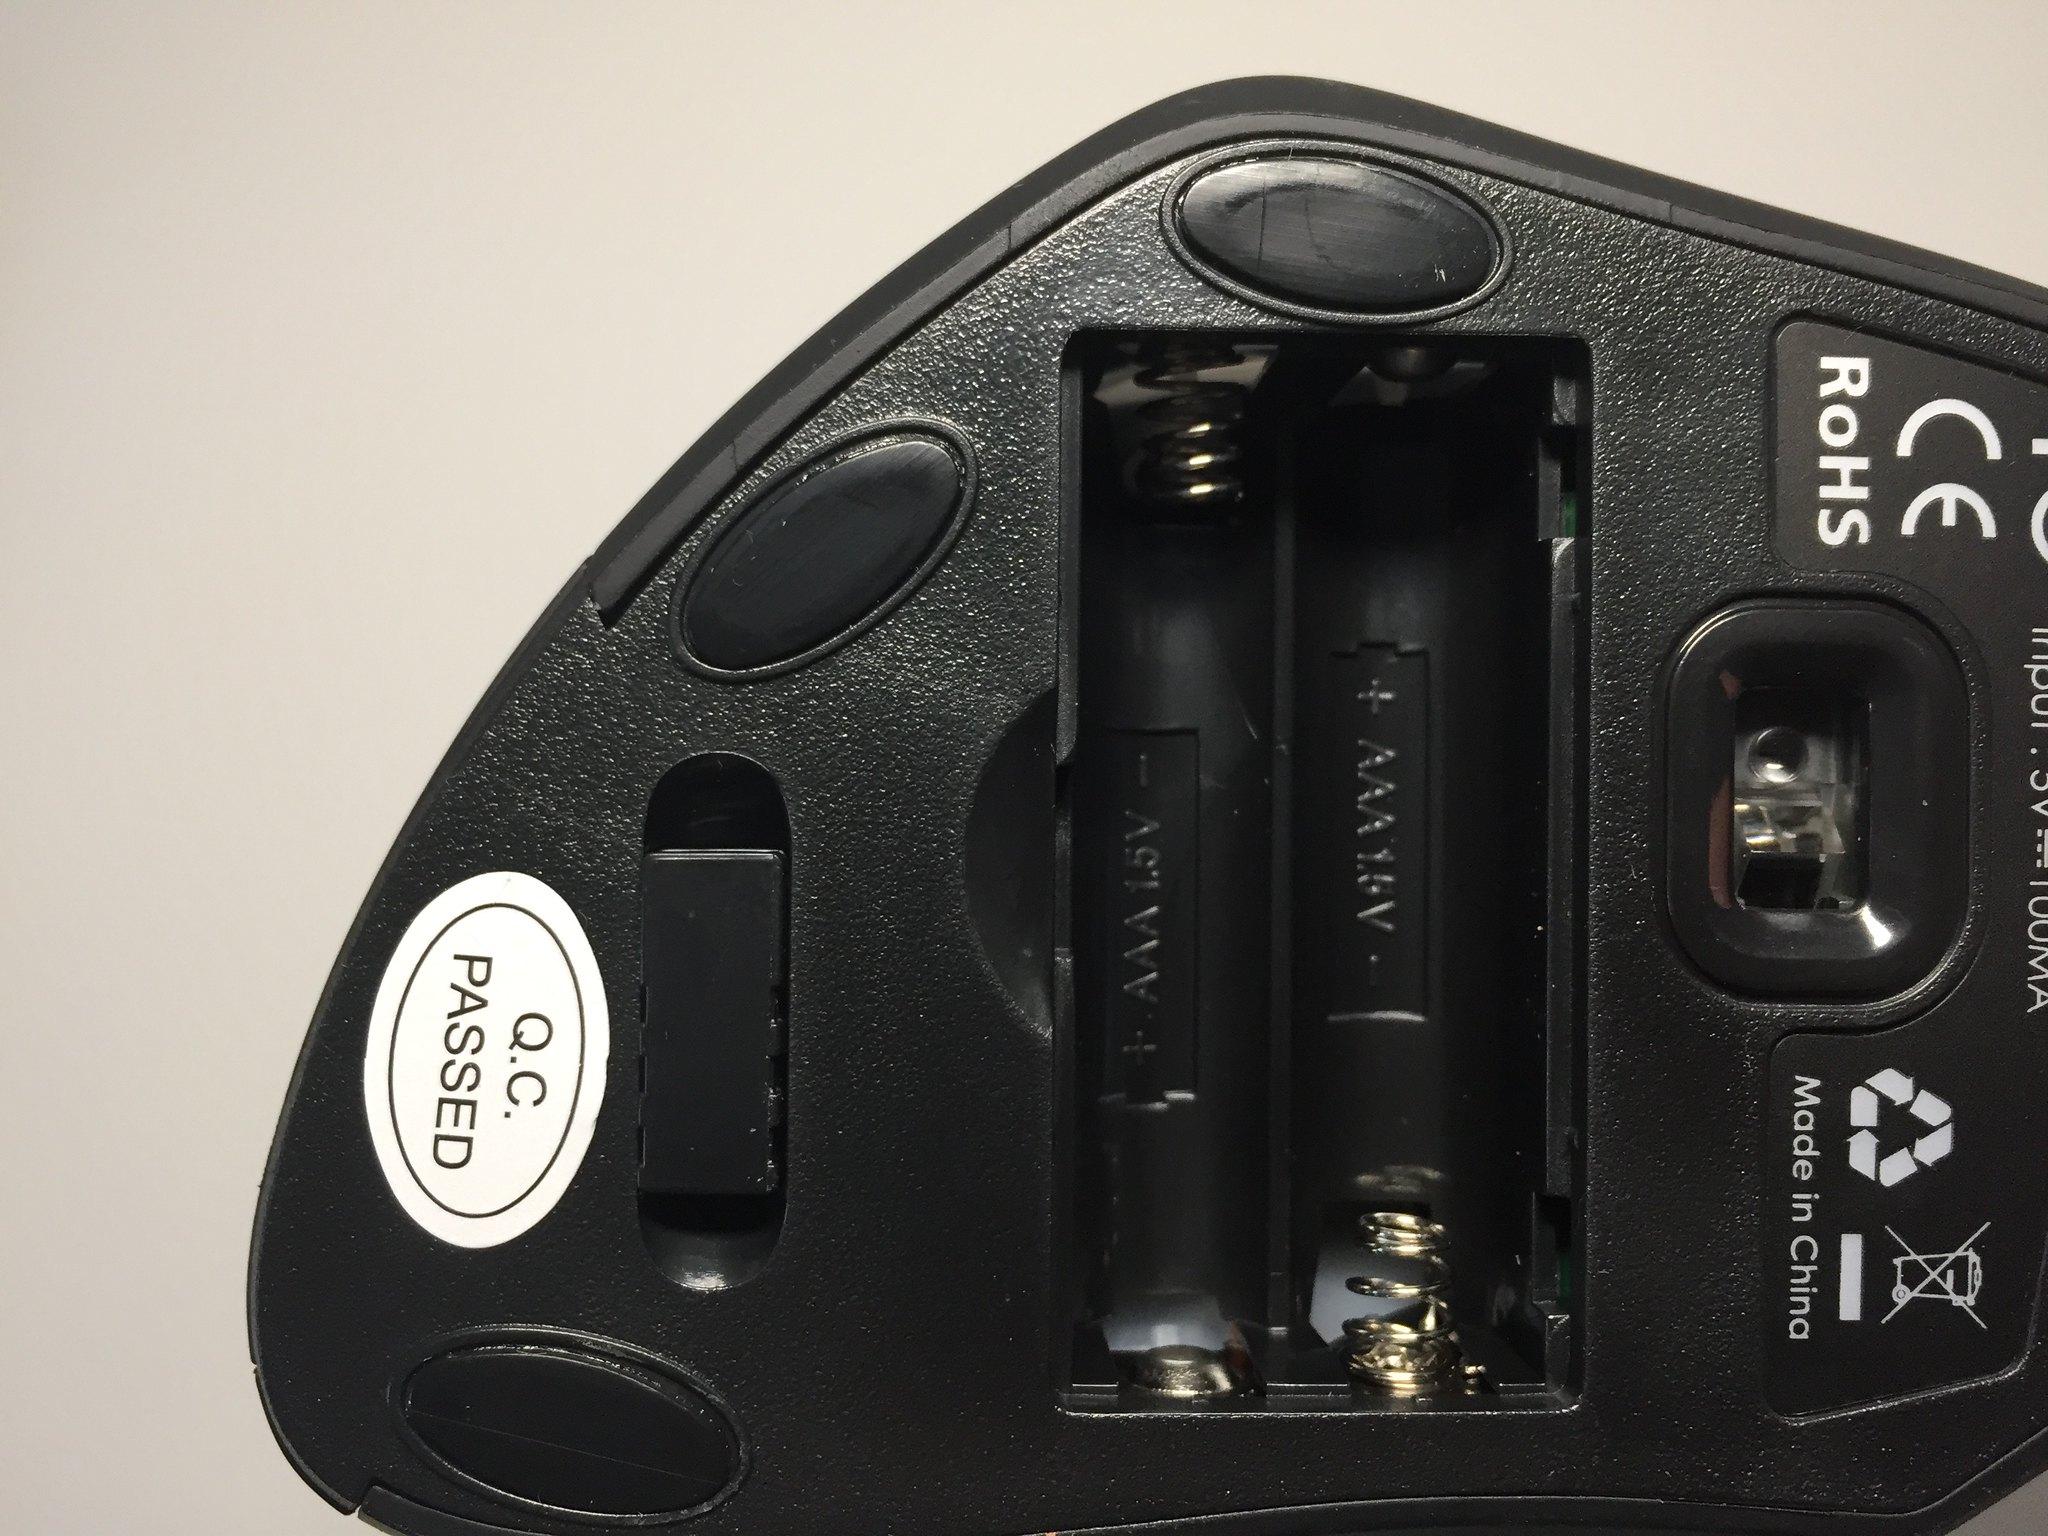 20170505 Test Souris verticale AUKEY 9